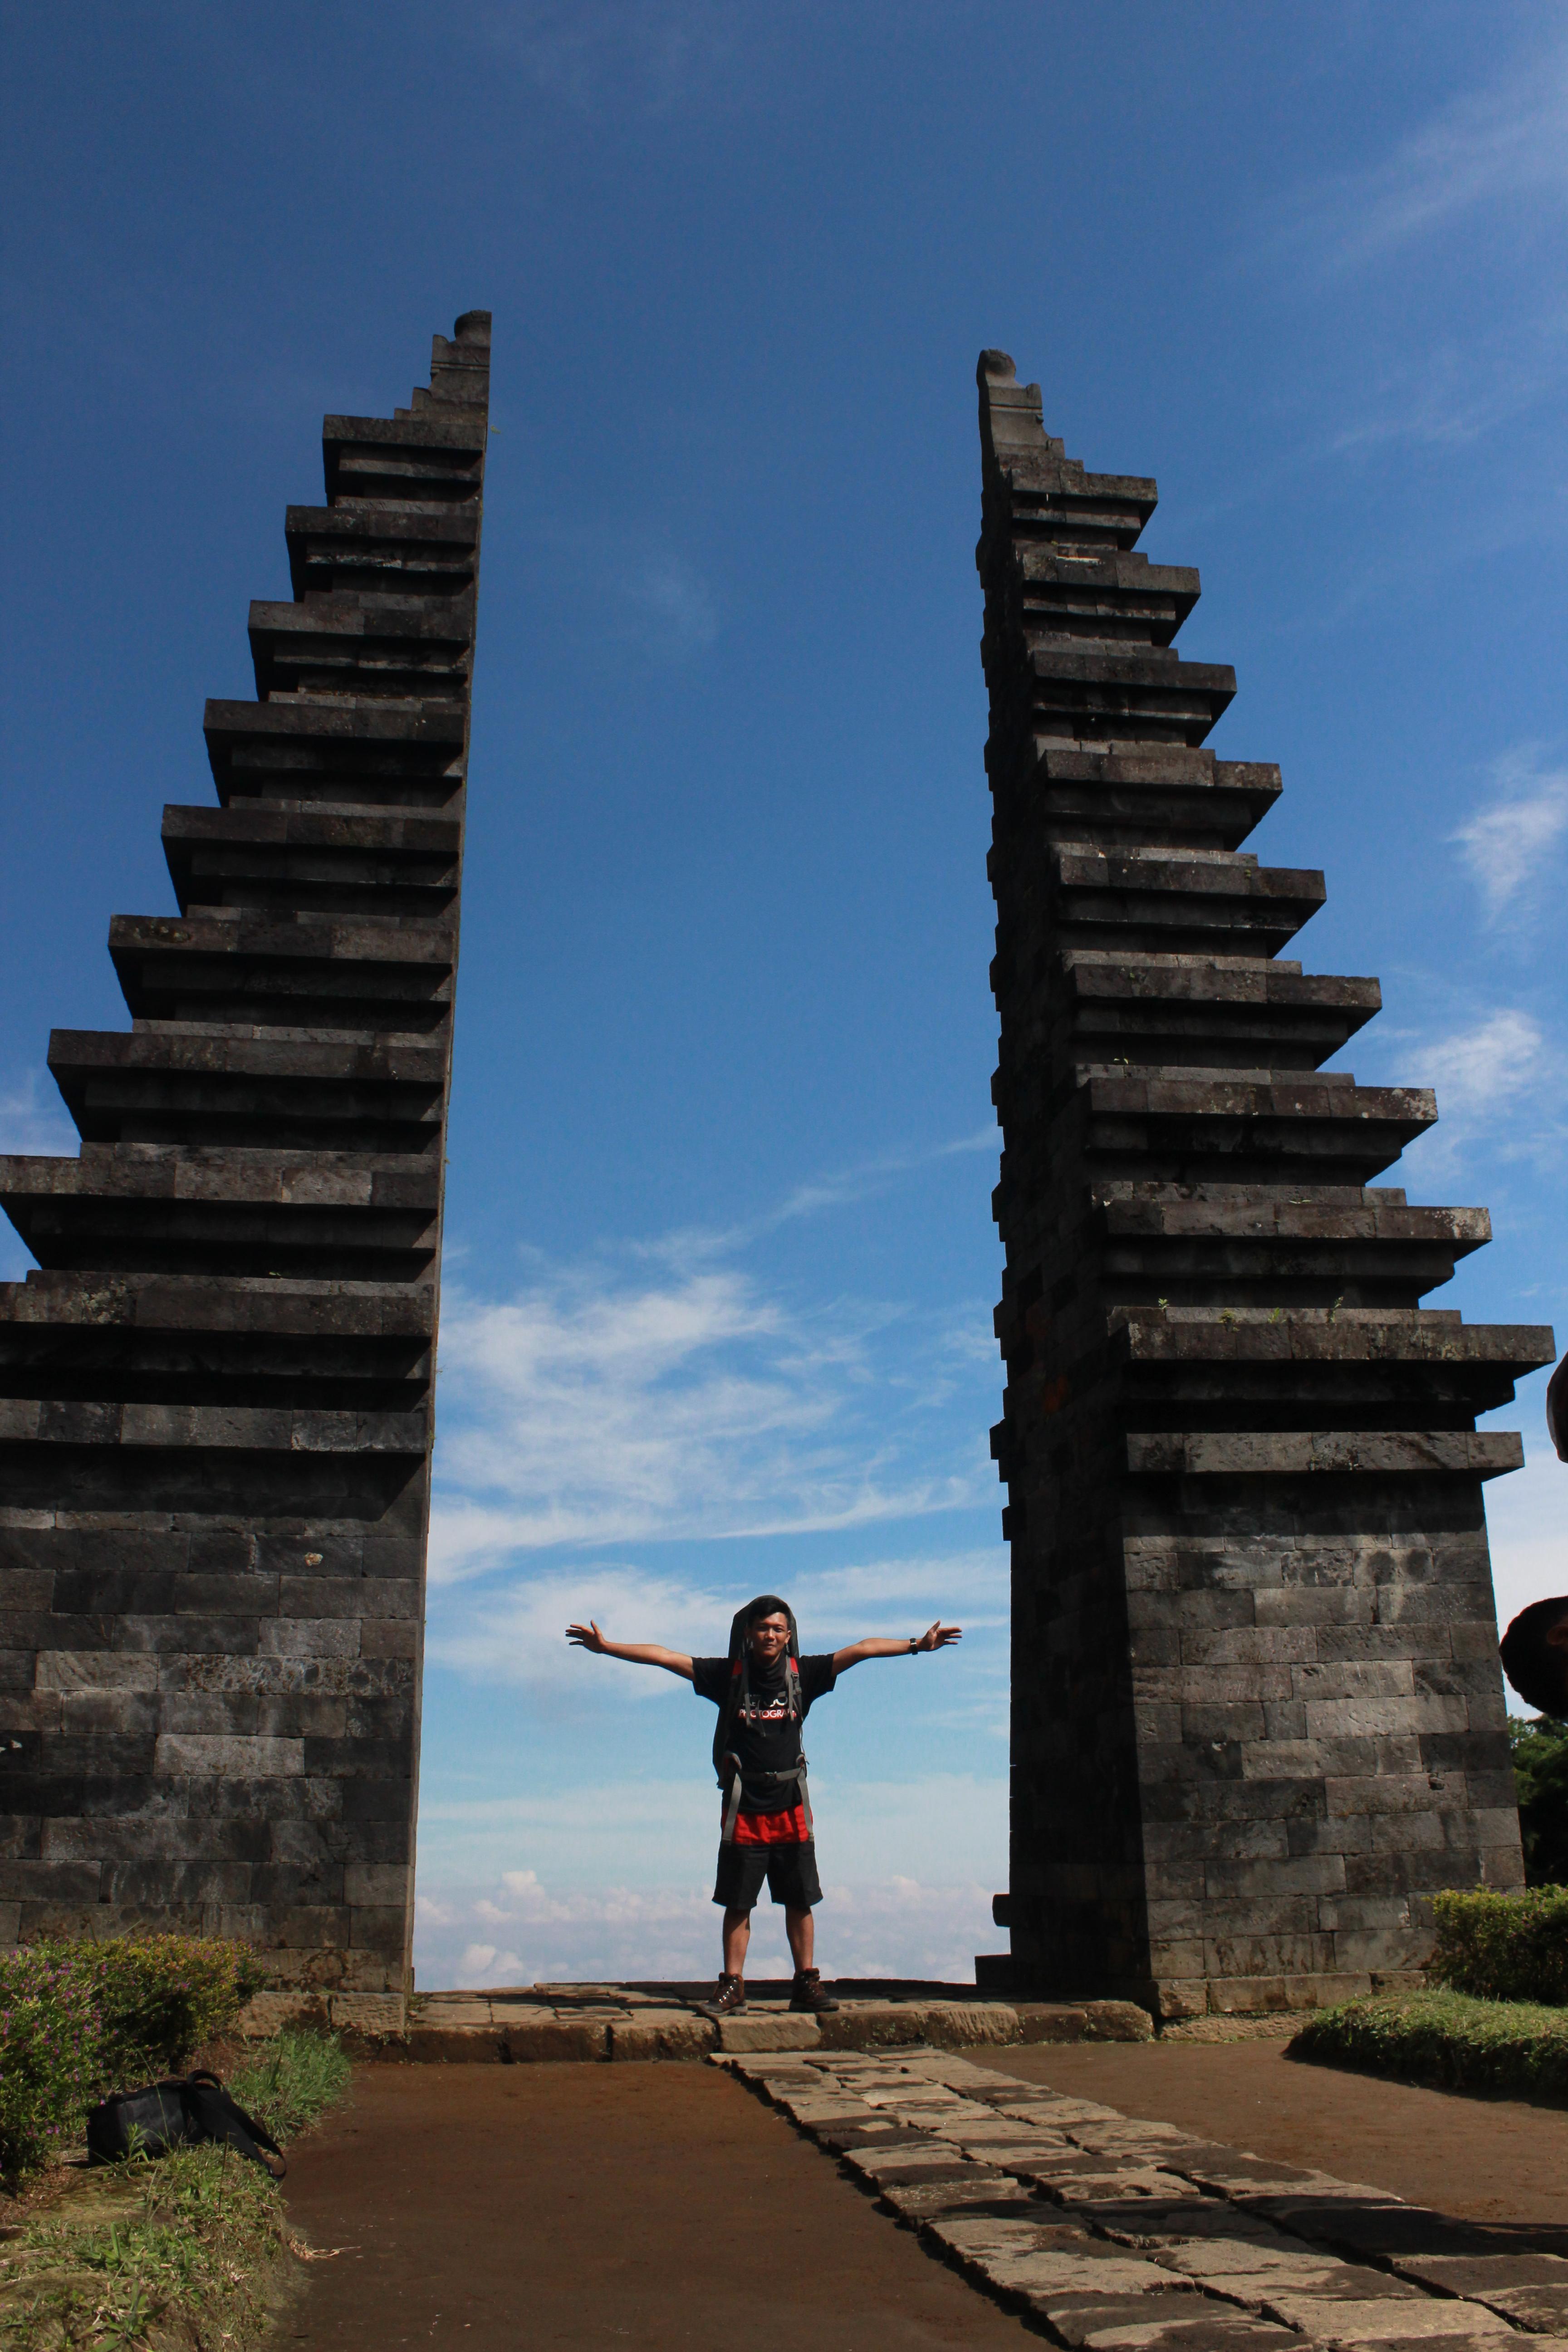 Candi Cetho Indonesia Gunung Lawu Pendakian Don Stop View Ceto